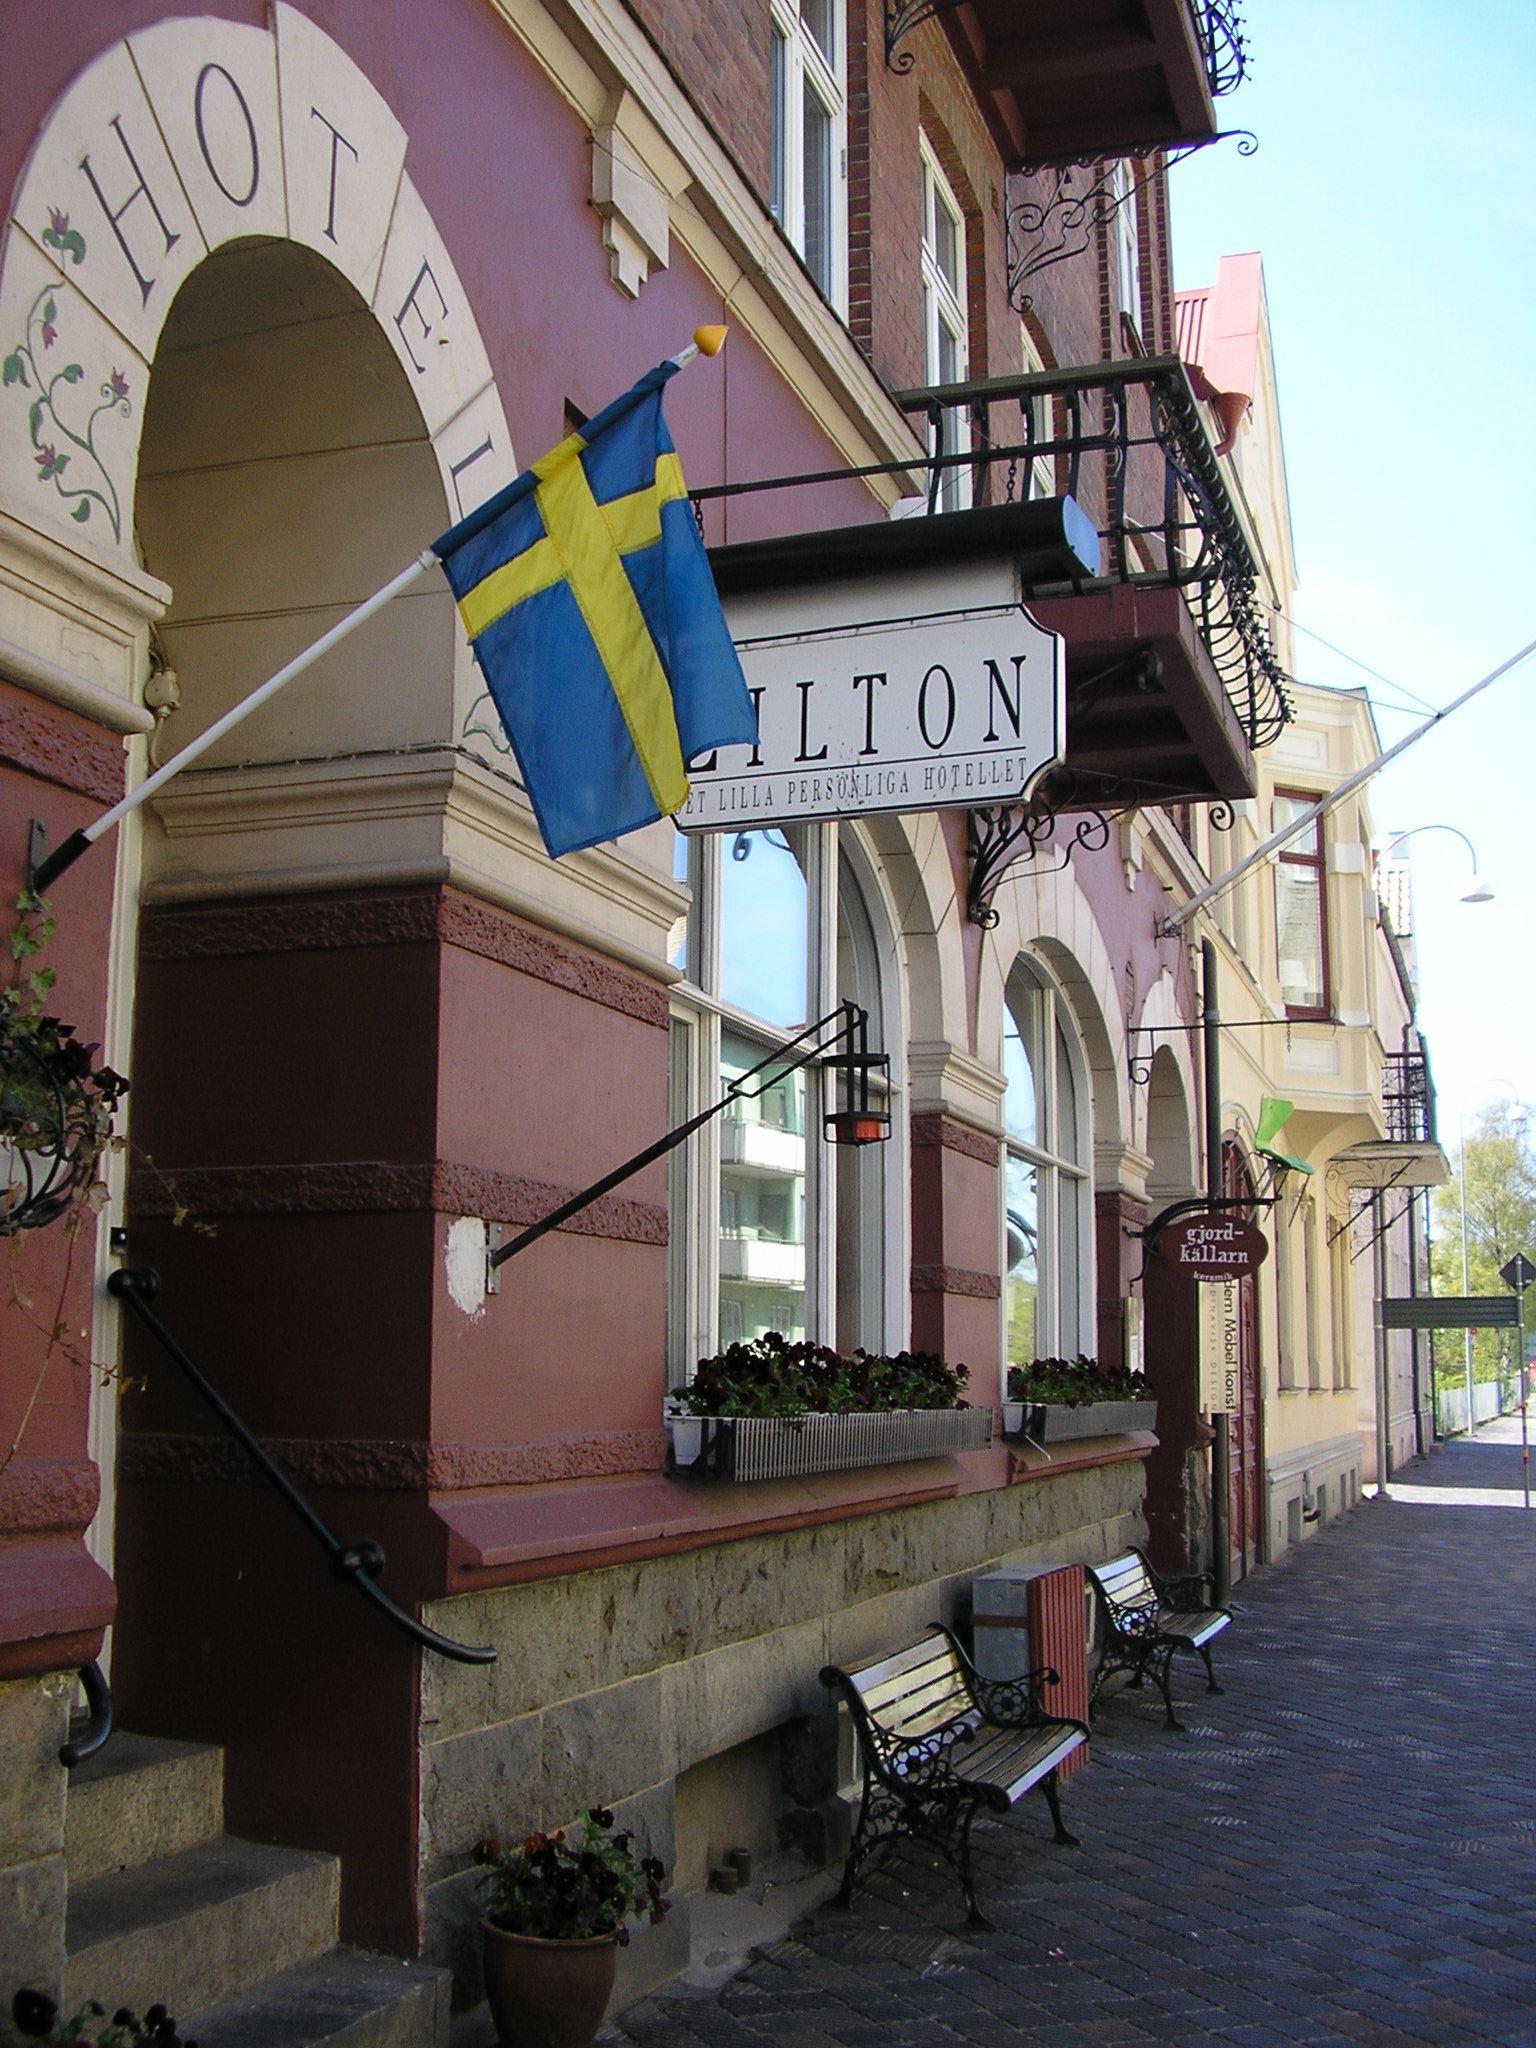 Hotel Lilton